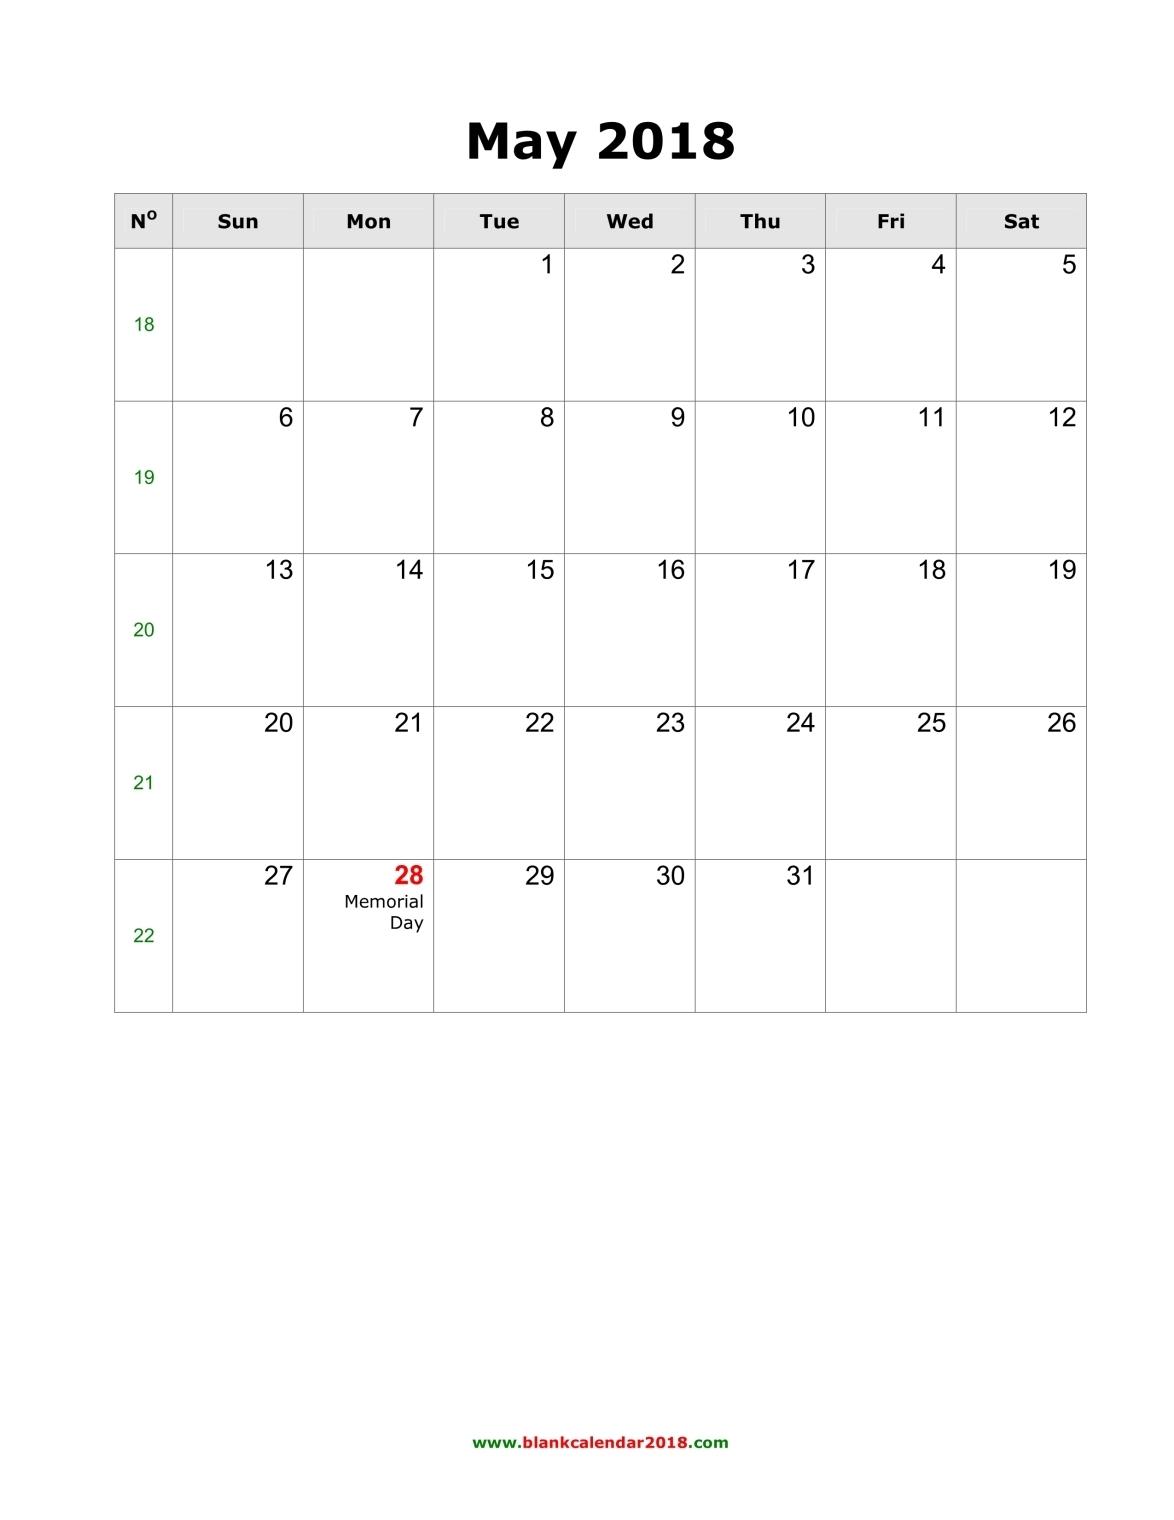 Blank Calendar For May